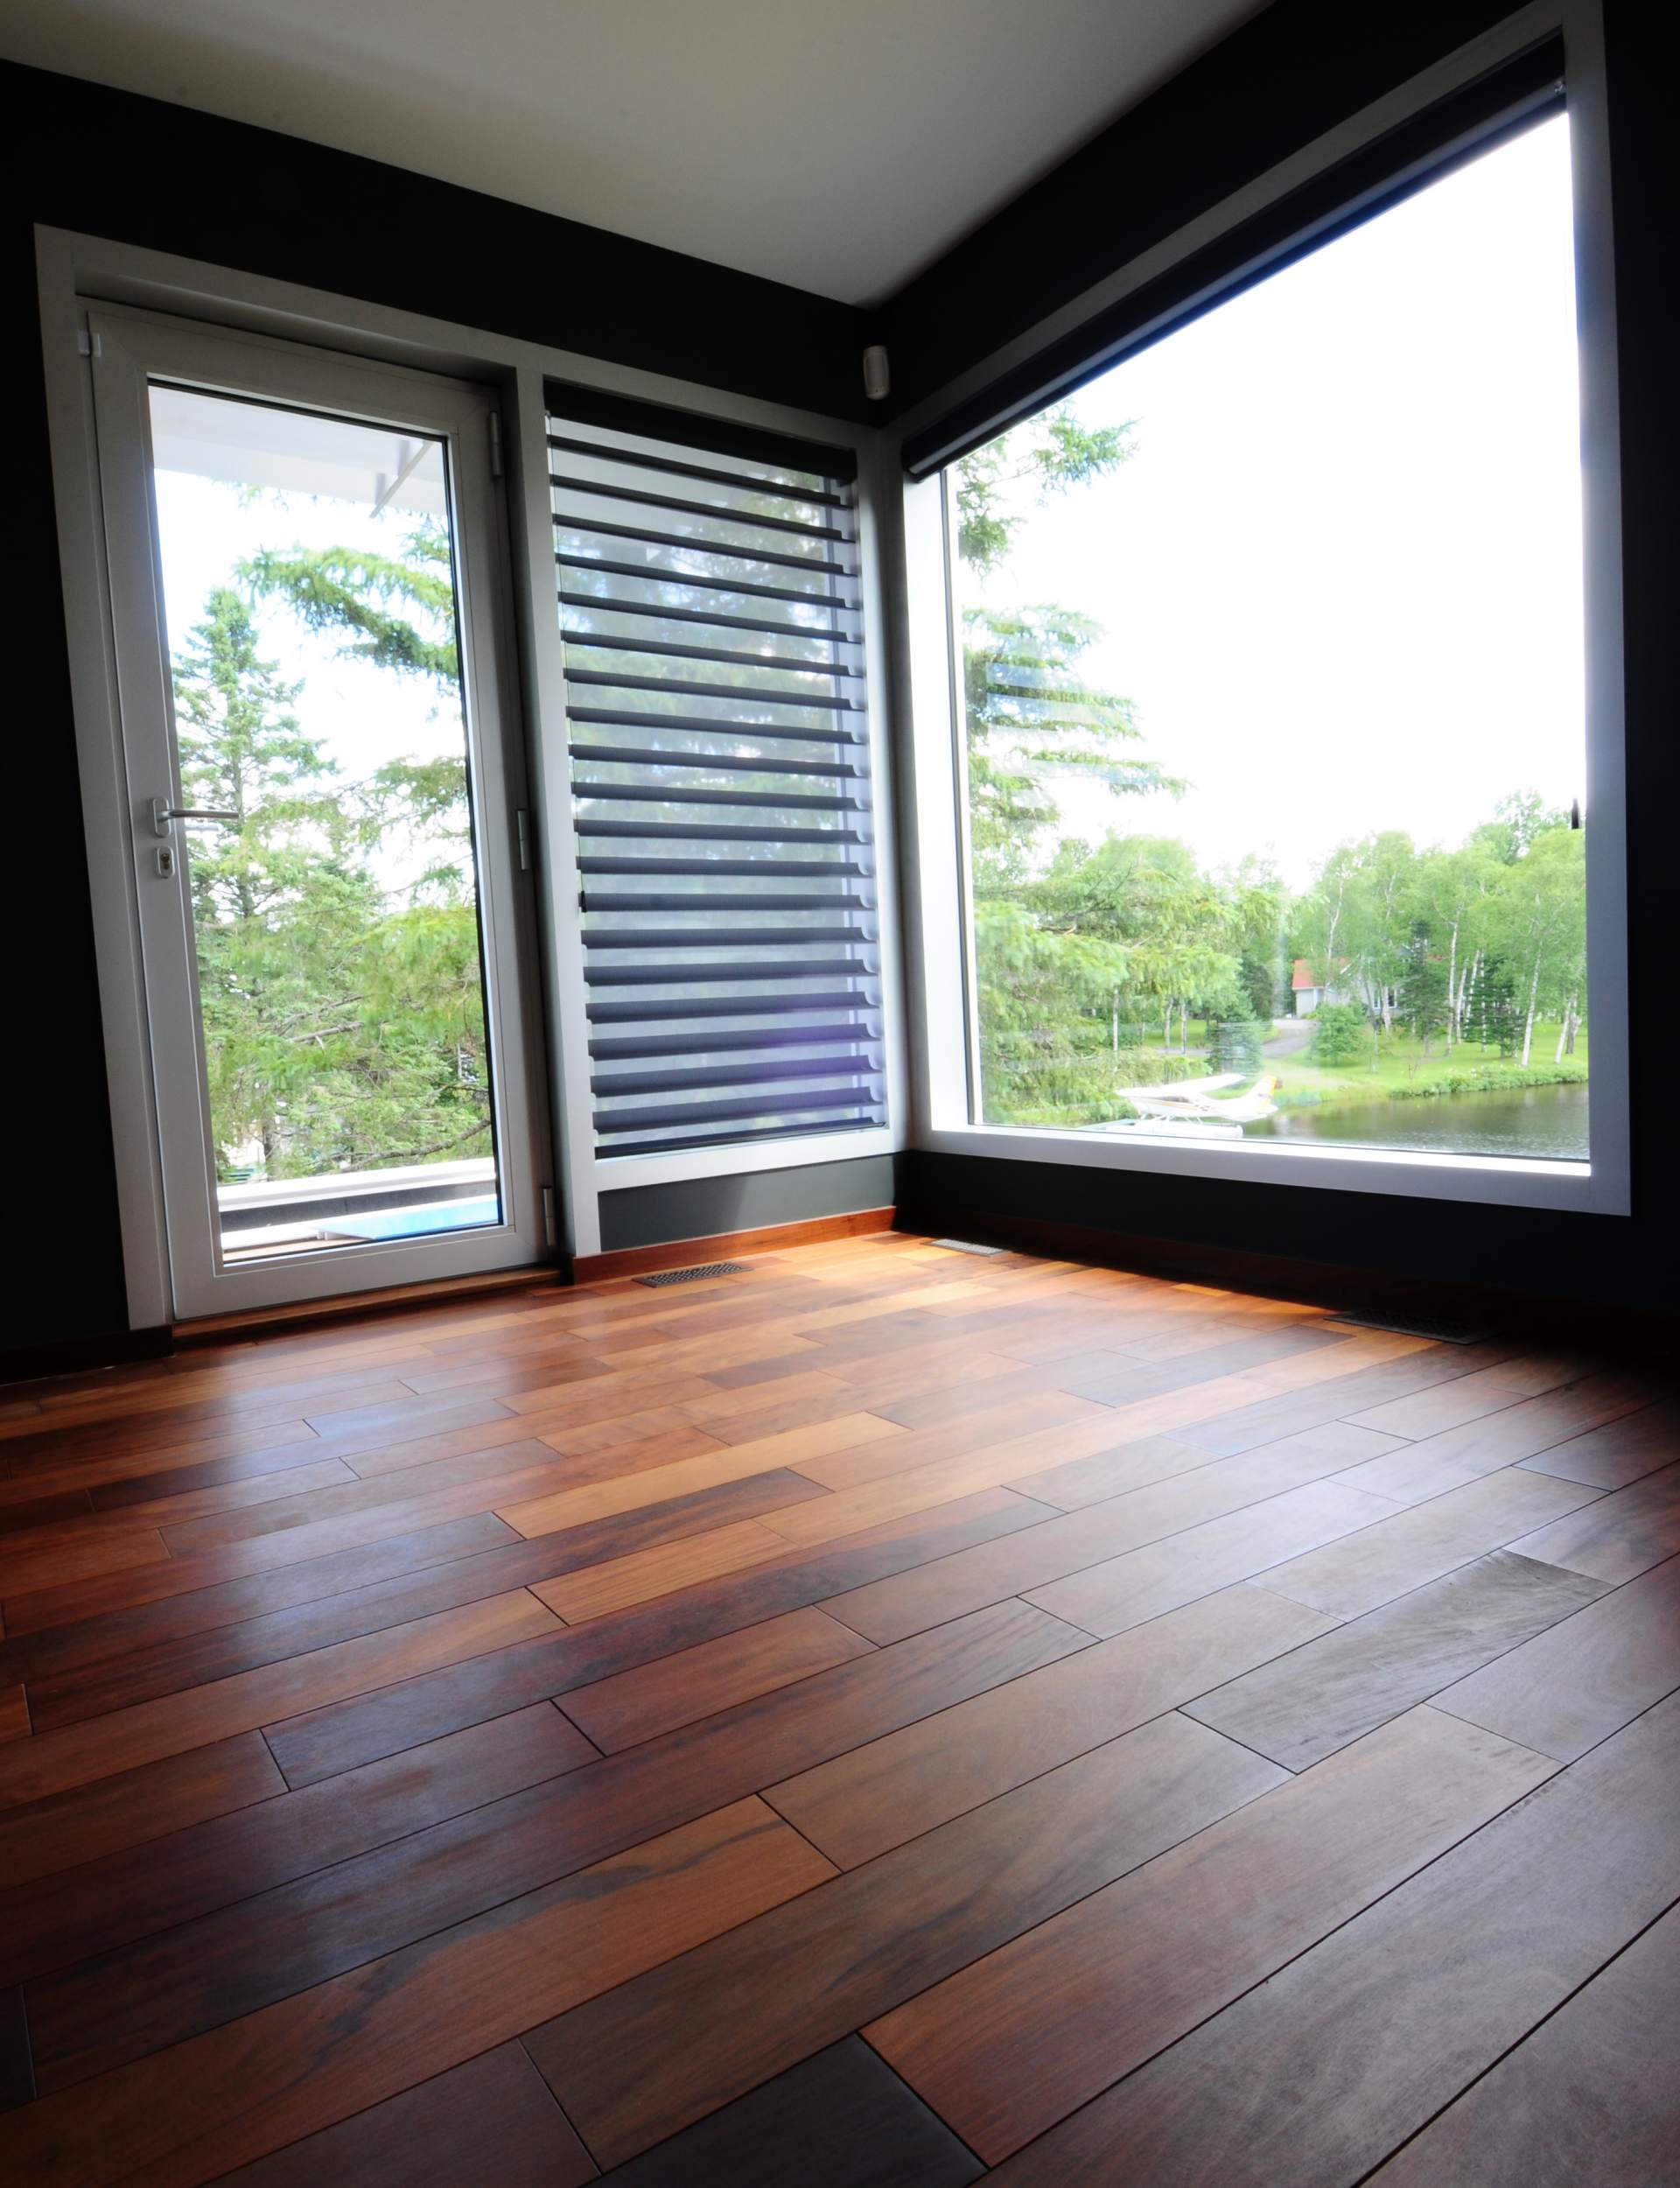 david gilbert plancher standard photos. Black Bedroom Furniture Sets. Home Design Ideas